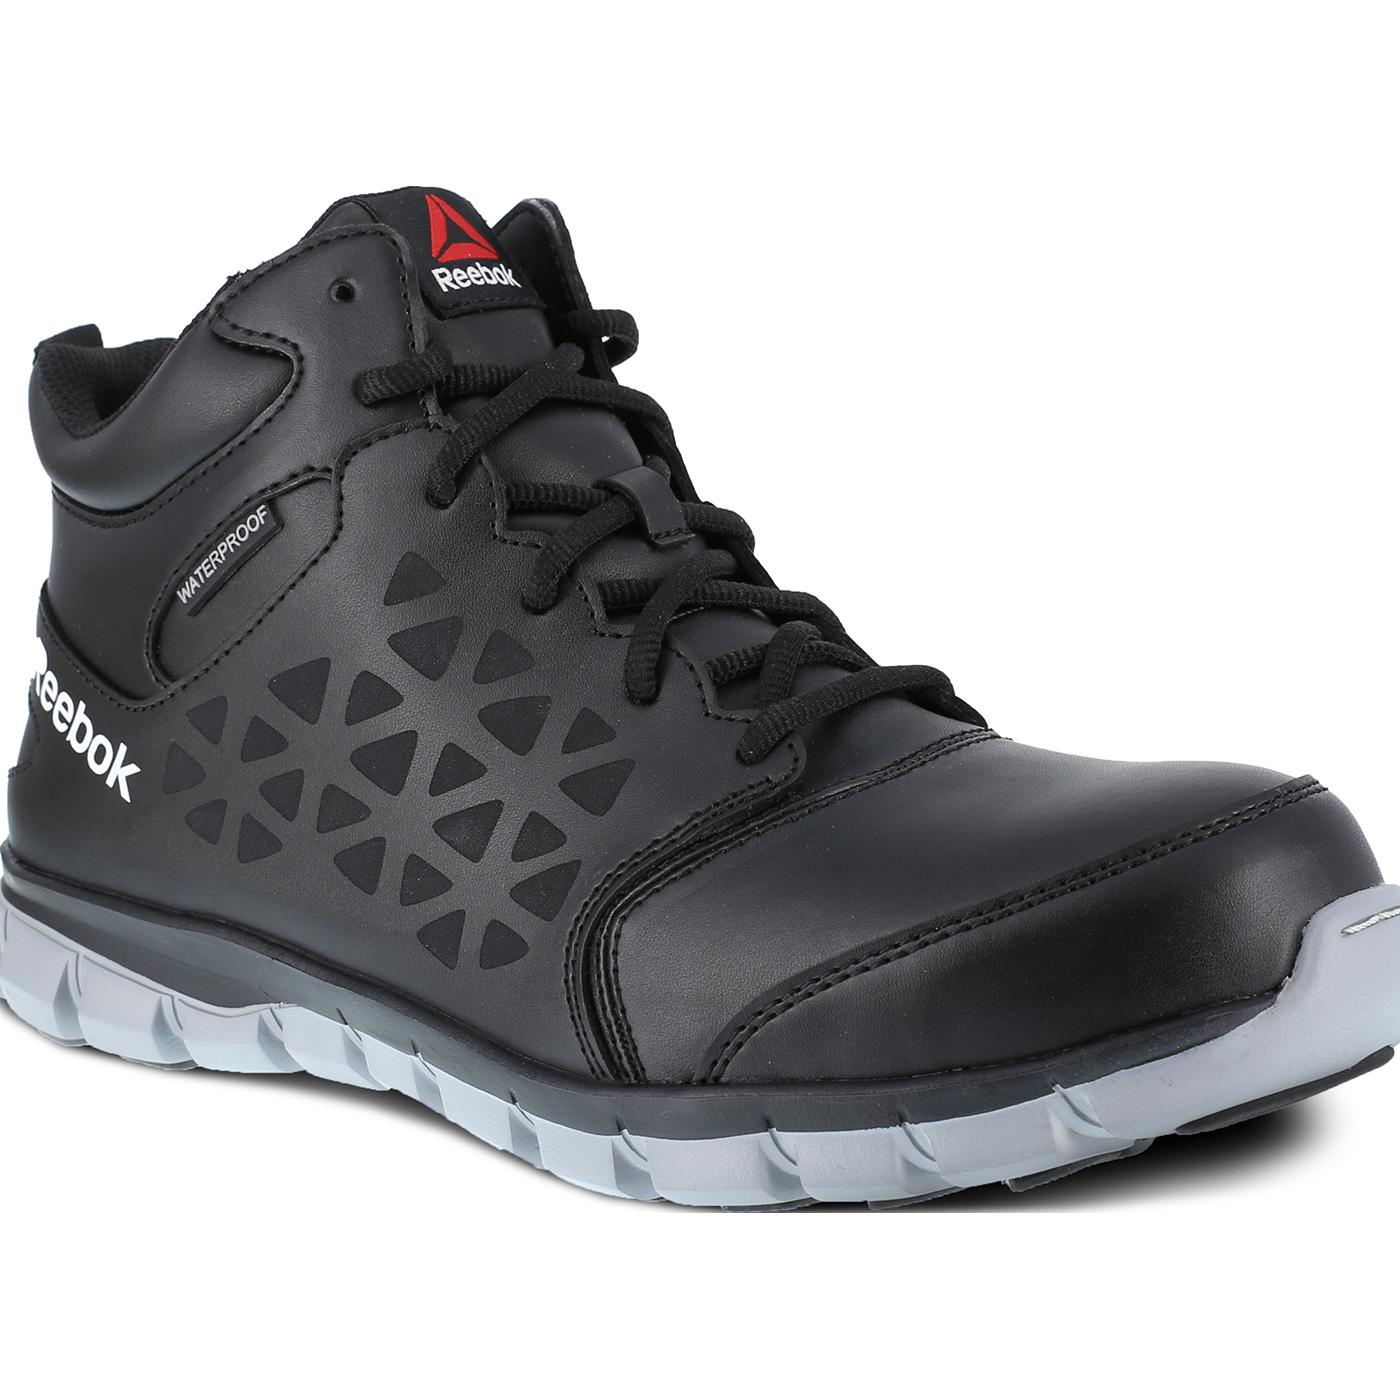 c243eee891c8e Reebok Sublite Cushion Work Men's Composite Toe Electrical Hazard  Waterproof Mid-Cut Athletic Shoe